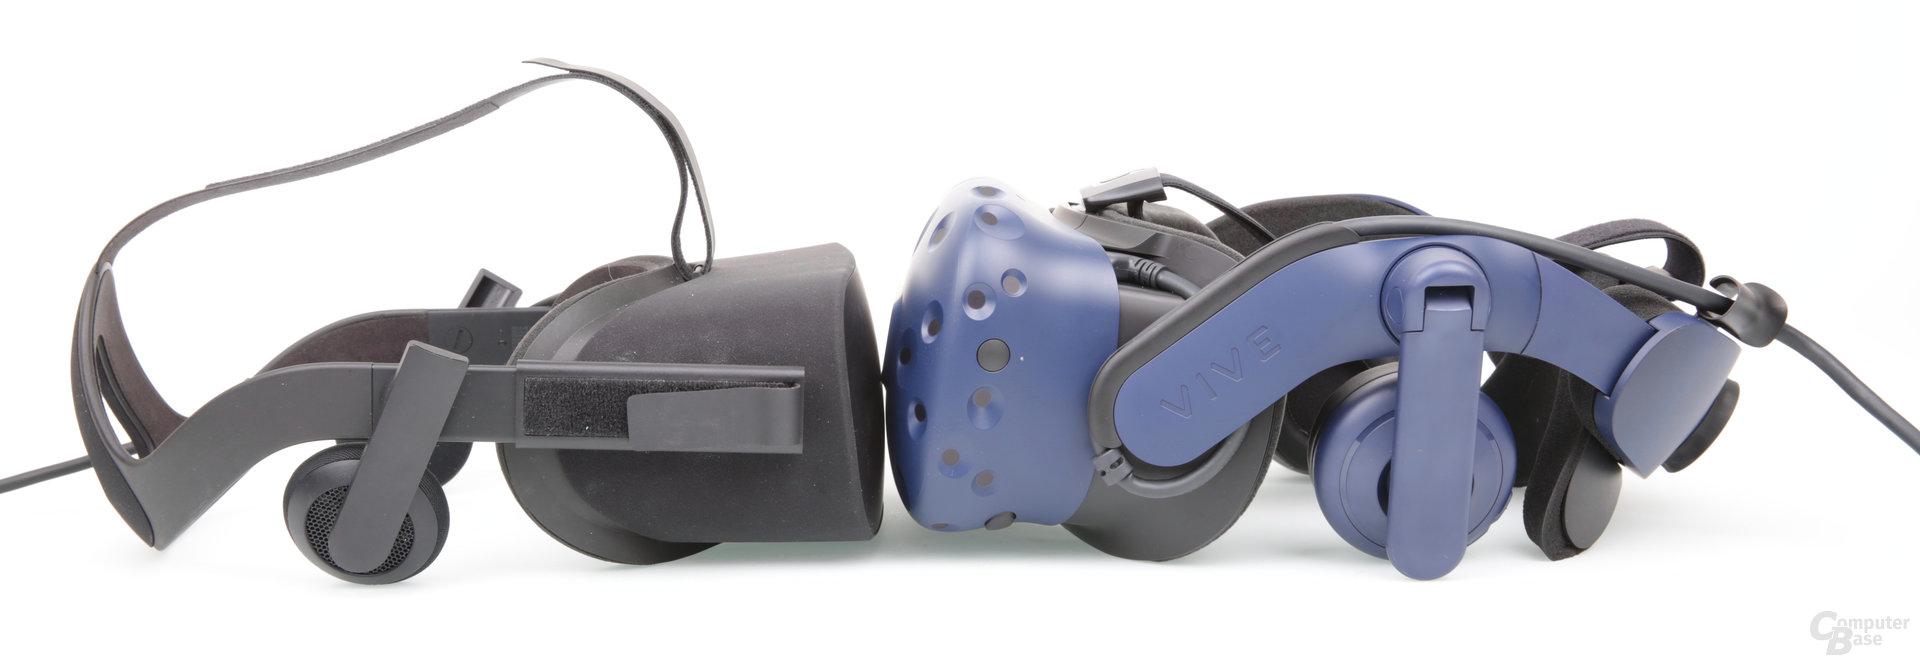 Oculus Rift vs. HTC Vive Pro